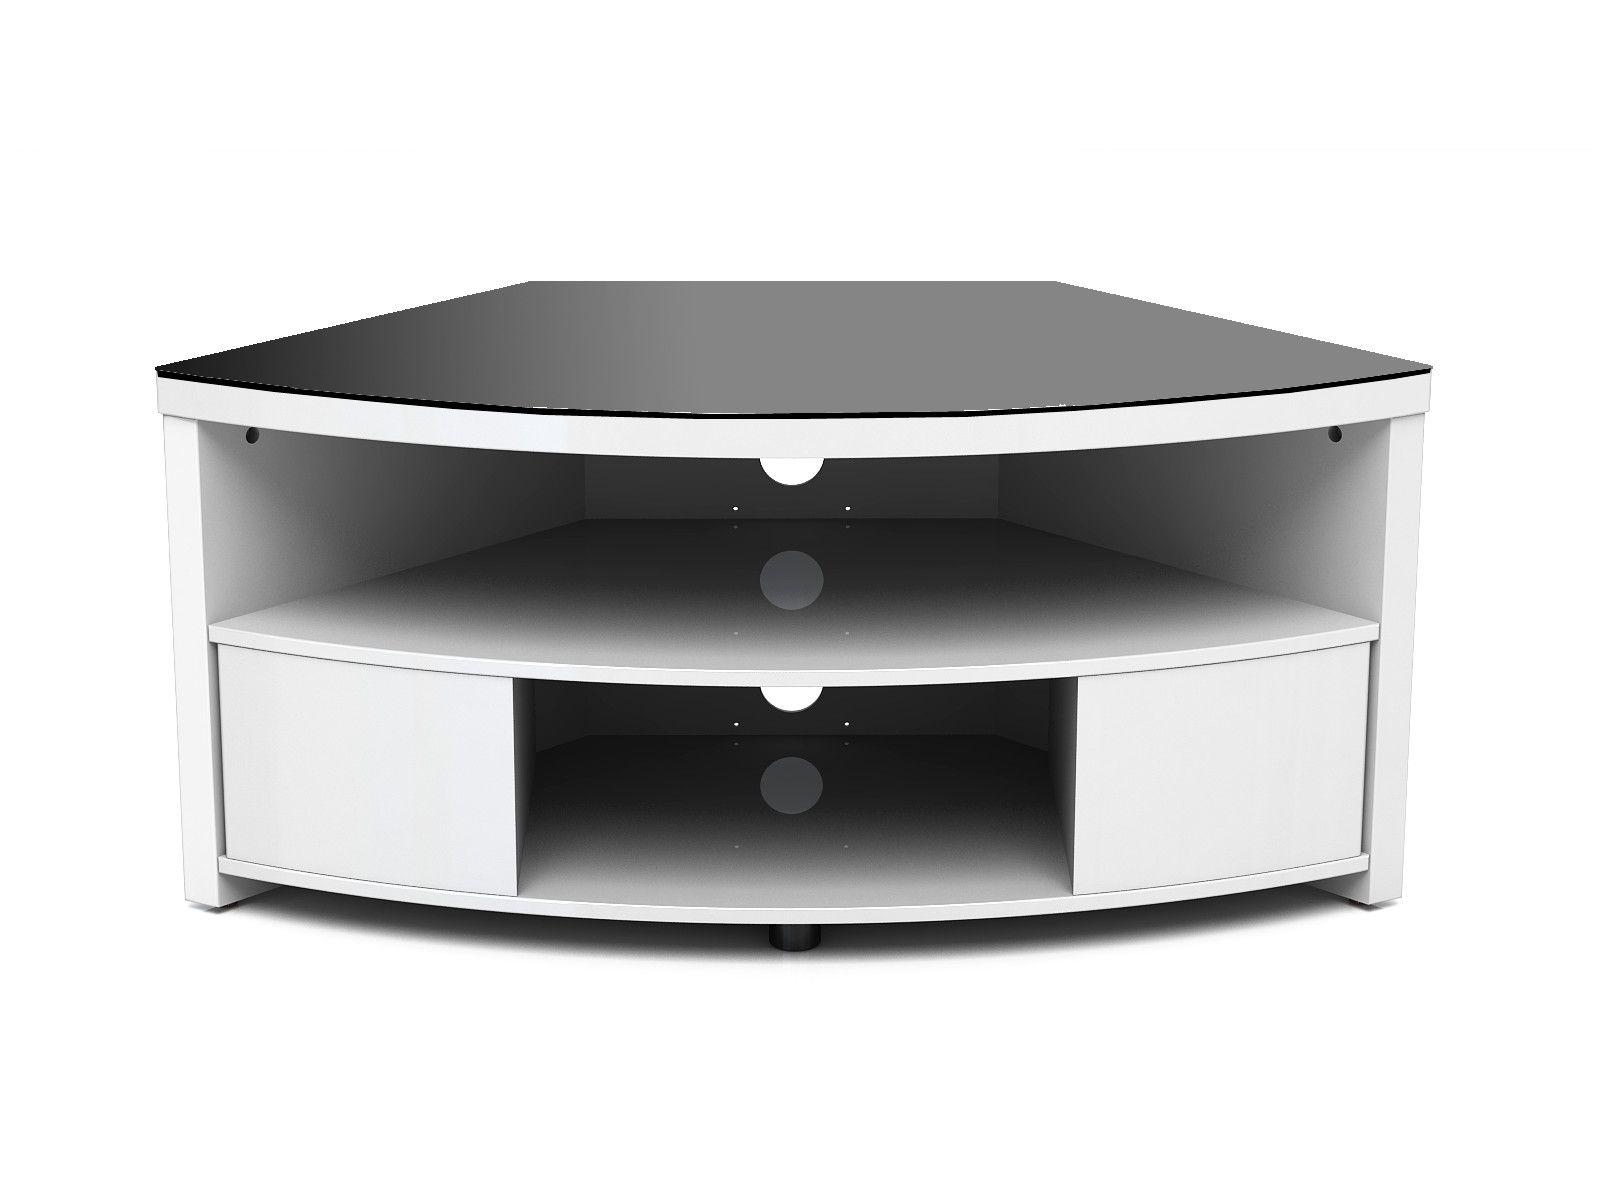 home haus heriot tv stand for tvs 32 42 reviews. Black Bedroom Furniture Sets. Home Design Ideas